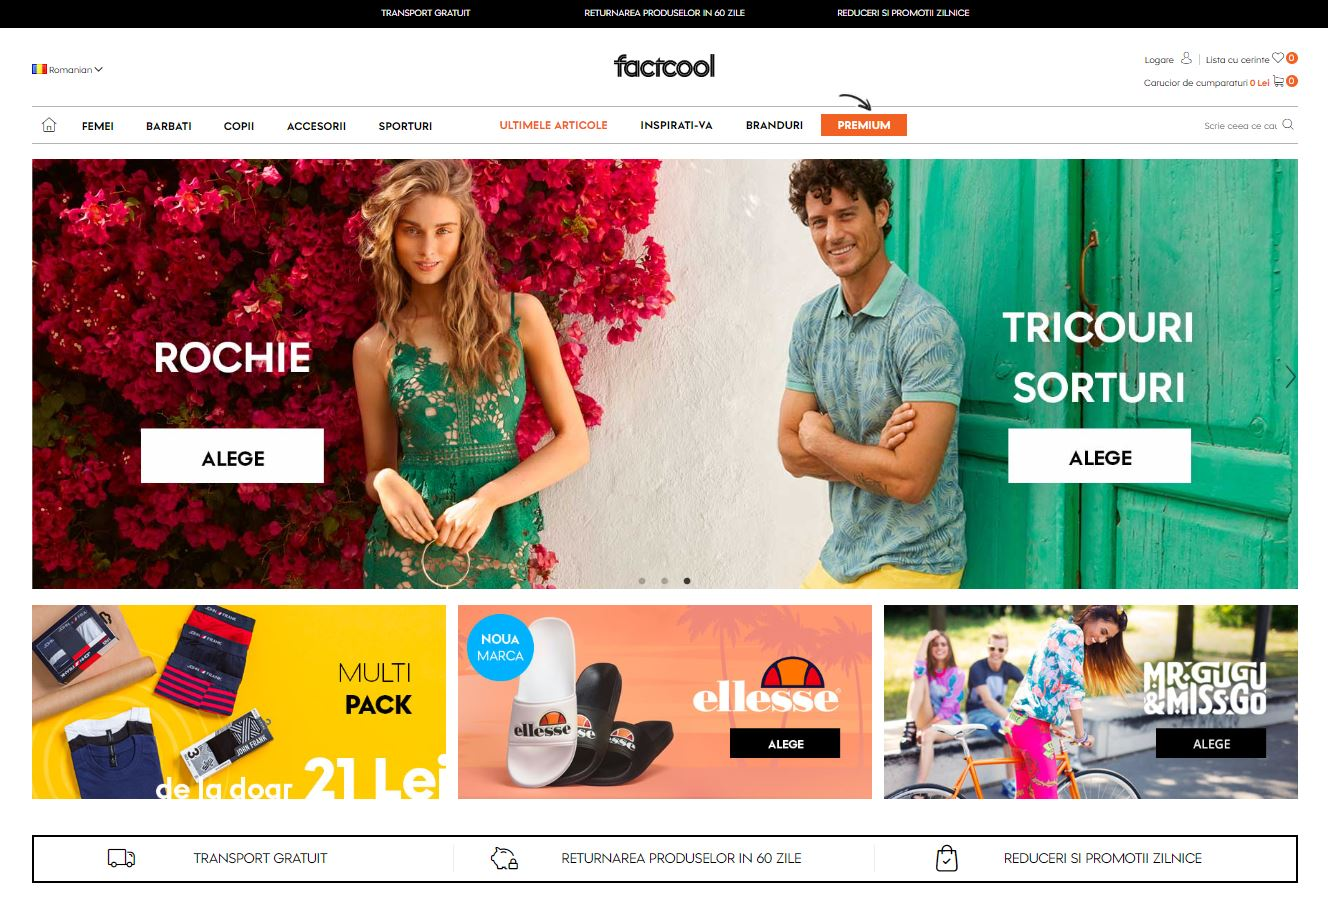 Magazinul online factcool.com